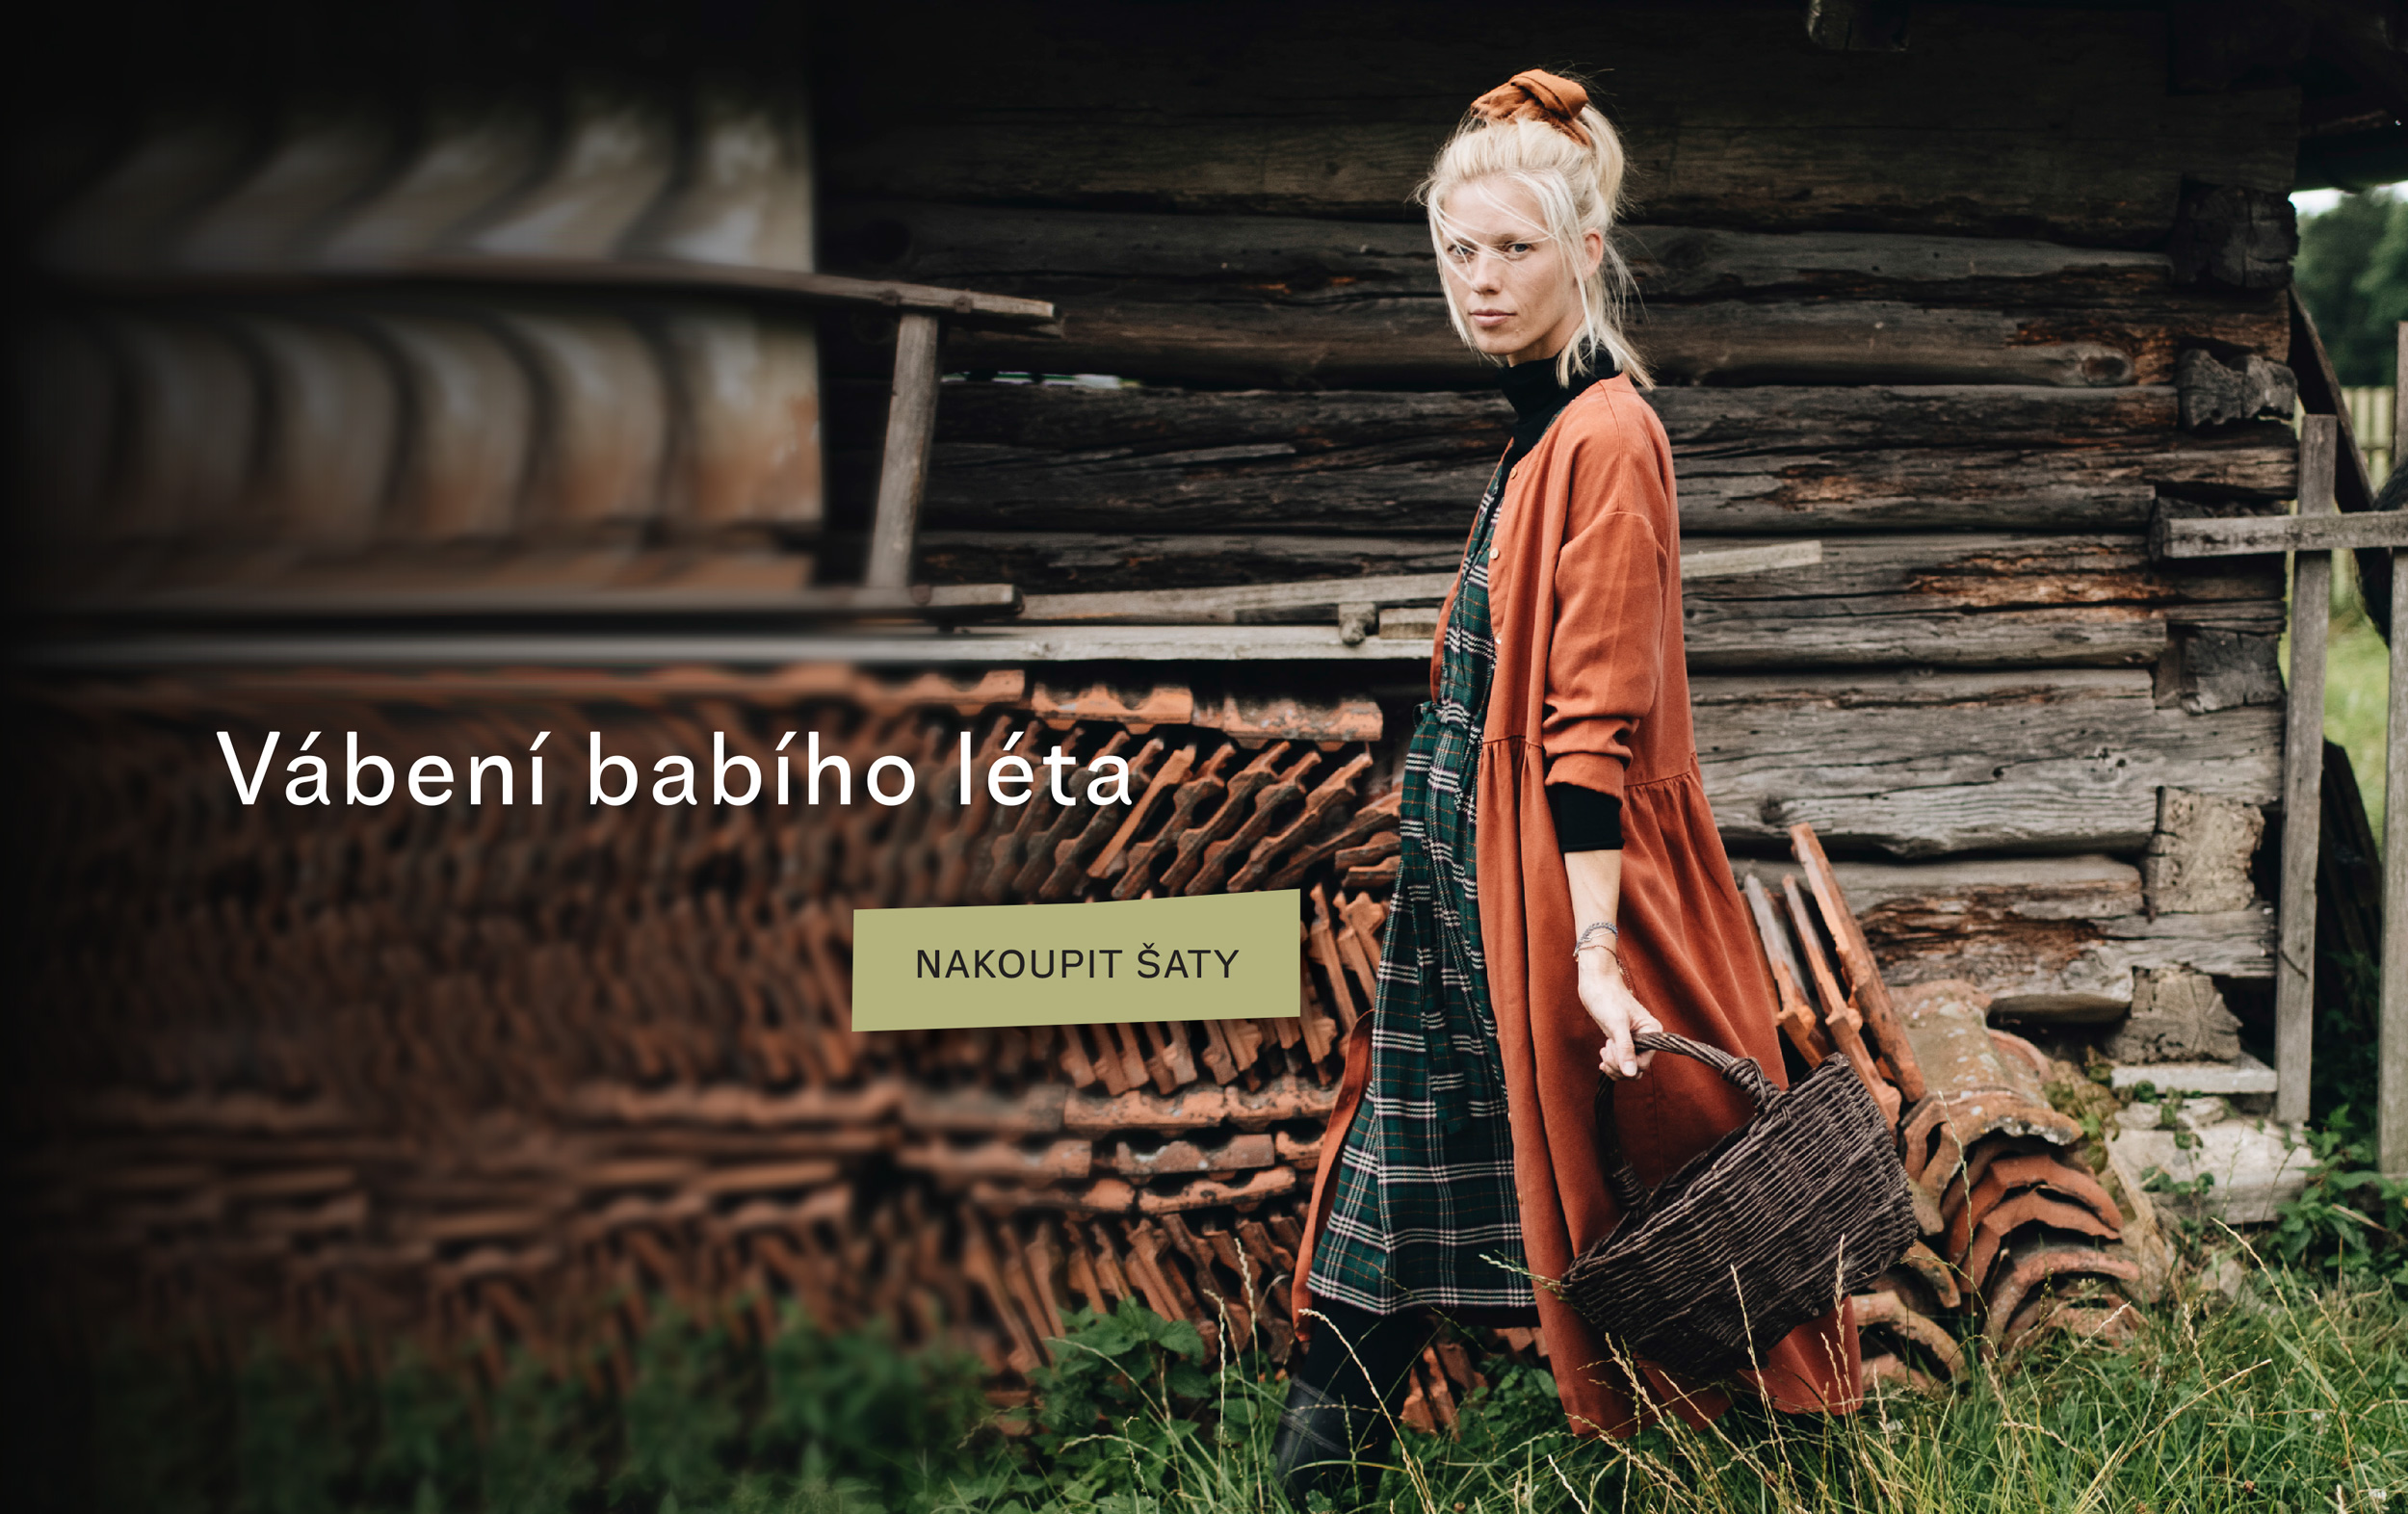 homepage_zari_2019_babi-leto.jpg